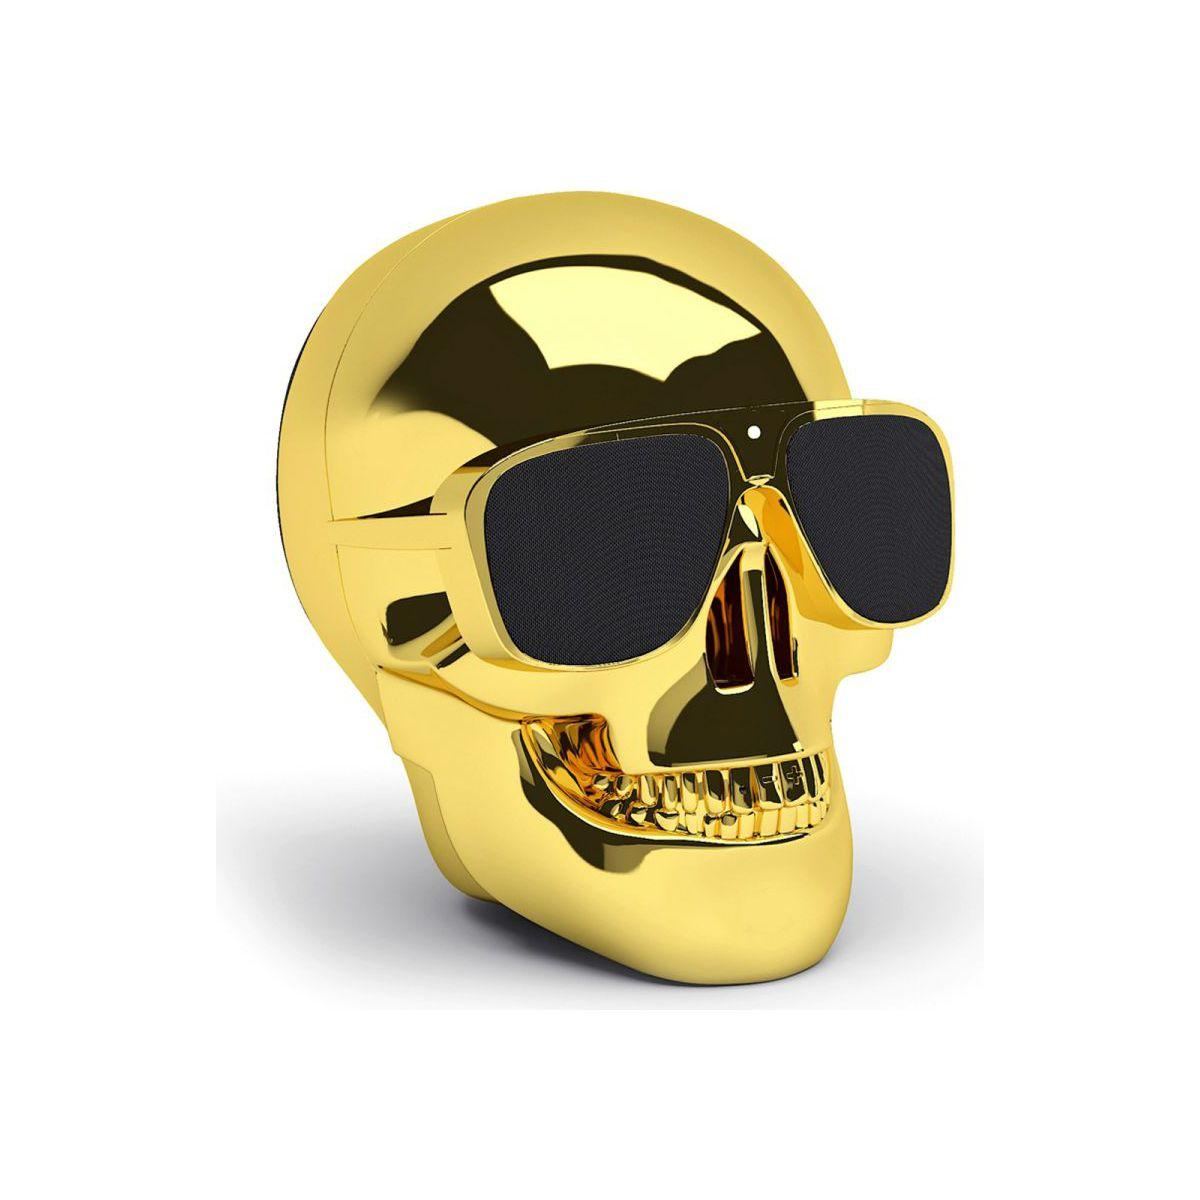 Enceinte bluetooth jarre aeroskull nano gold - 20% de remise imm�diate avec le code : fete20 (photo)